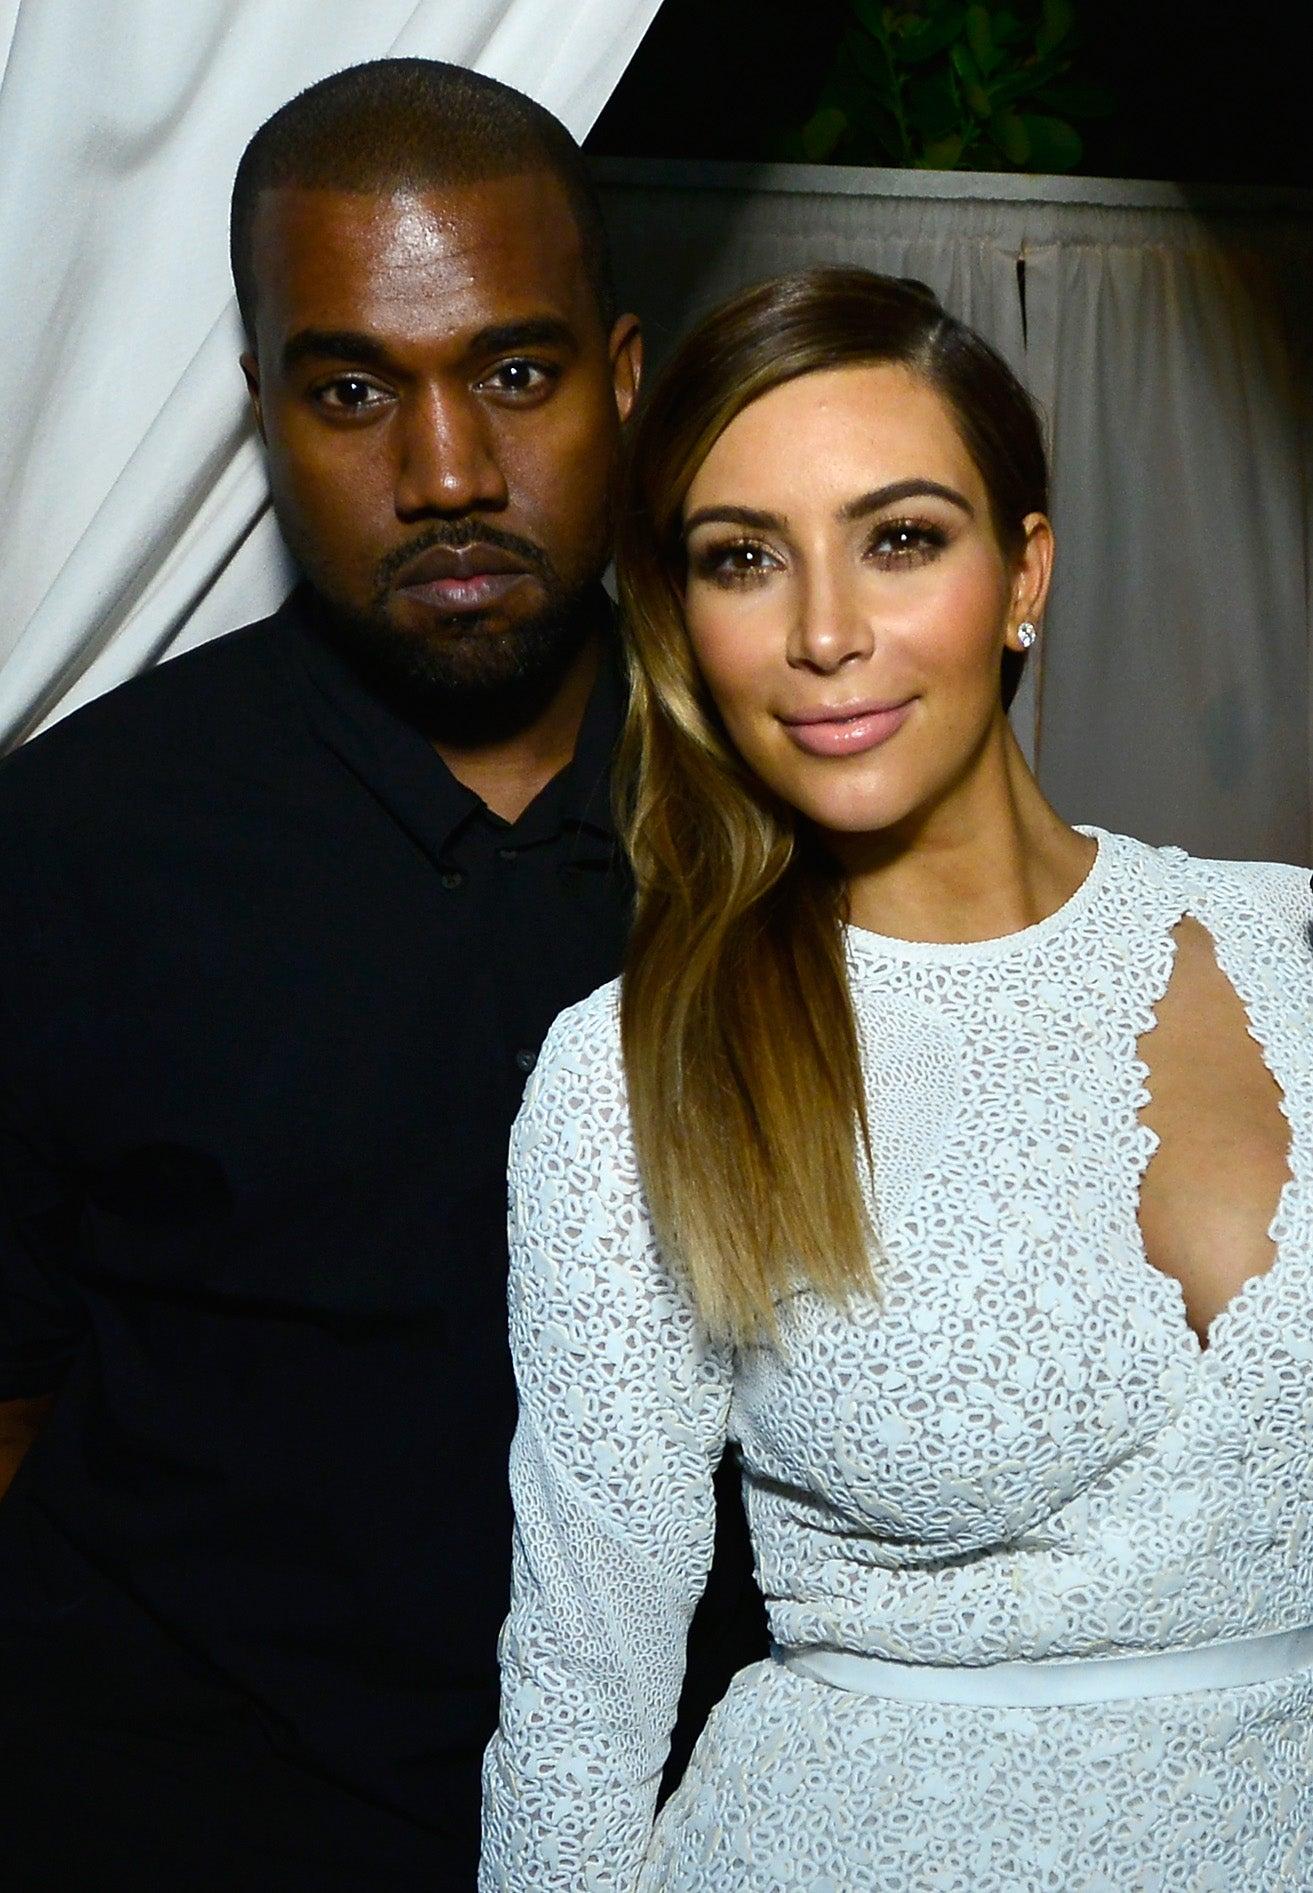 The Gender Of Kanye West And Kim Kardashian's Third Baby Revealed